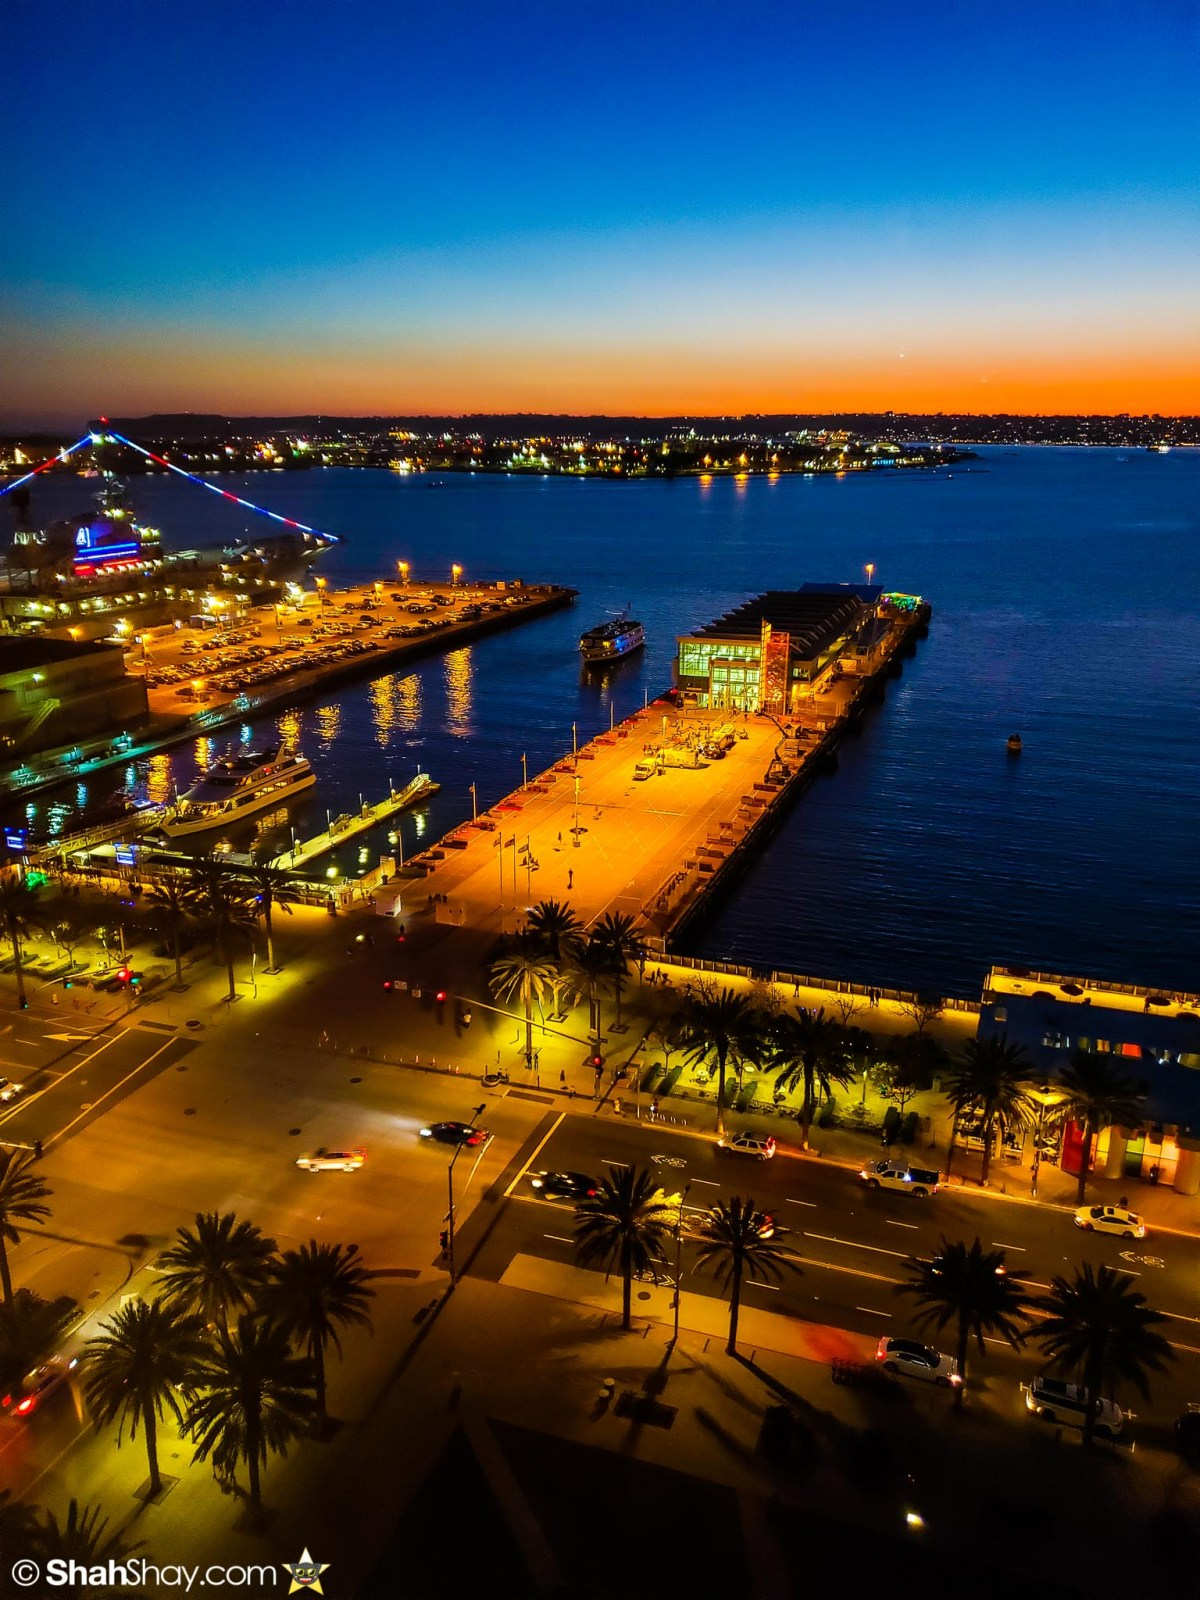 InterContinental San Diego Fitness Center - Sunset View